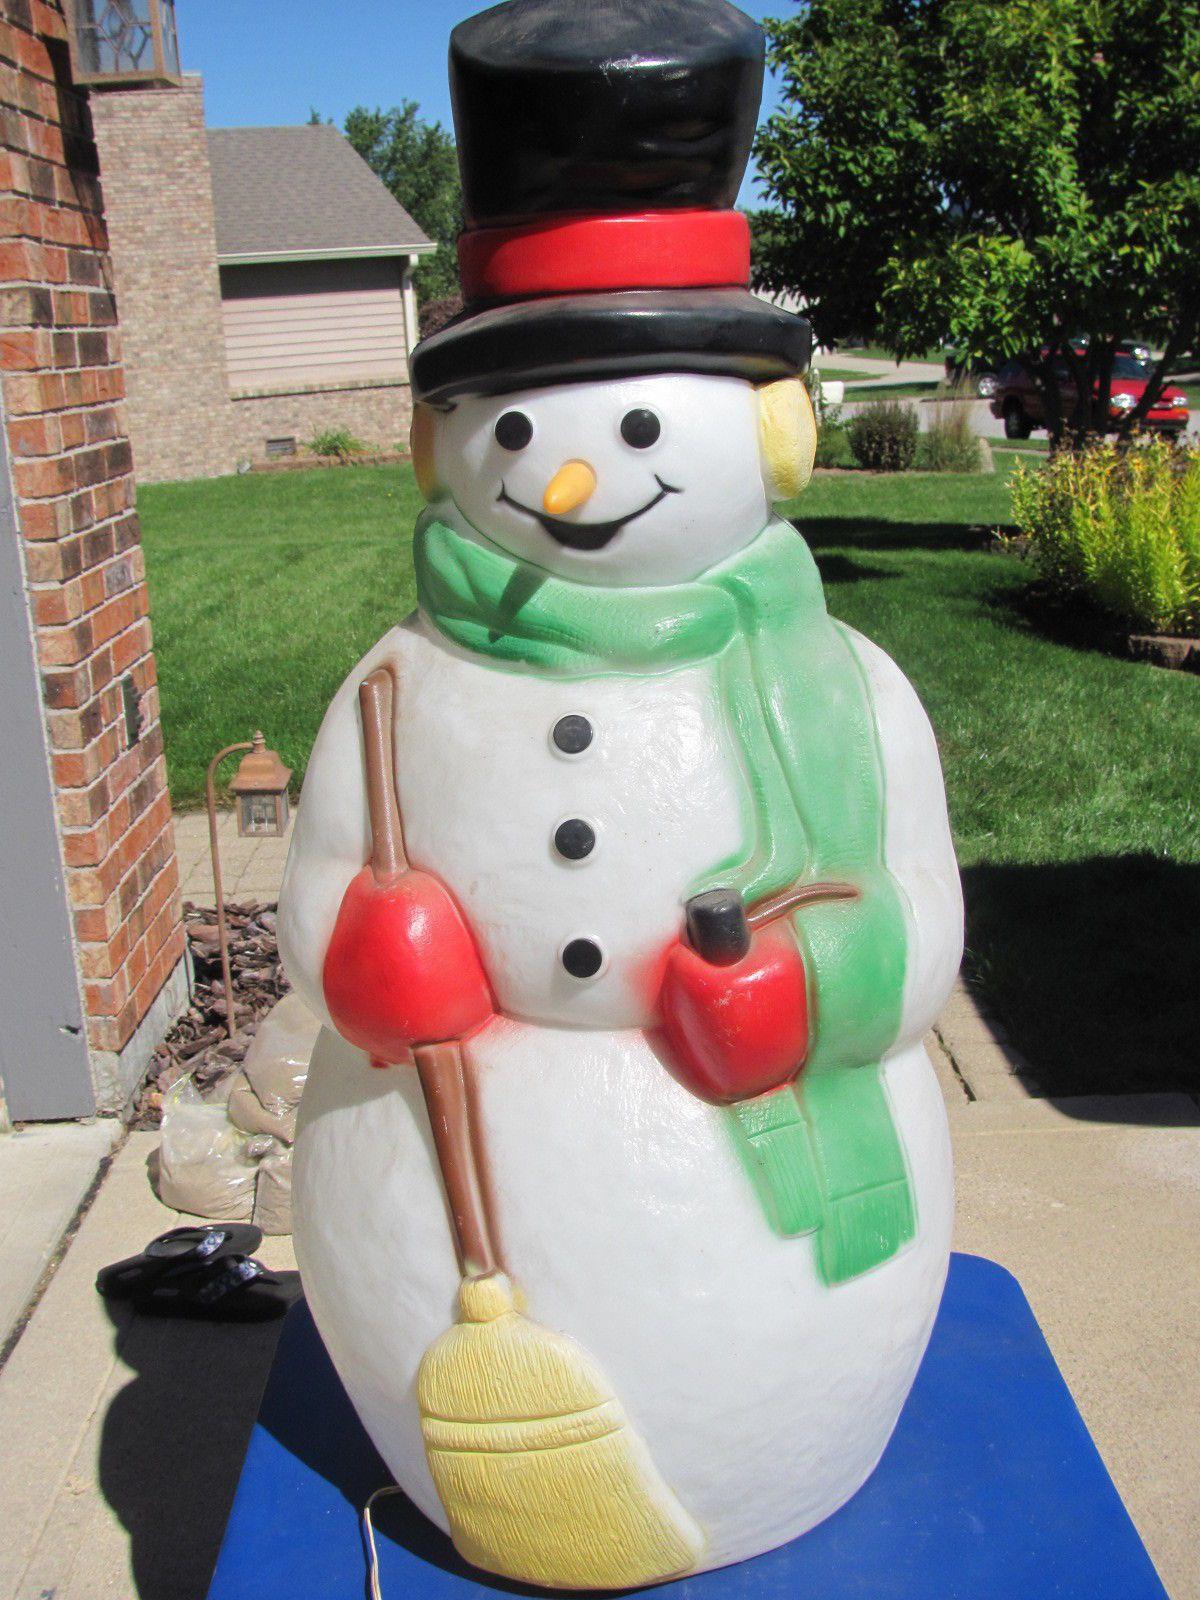 38 empire snowman carrot nose xmas blowmold light up plastic 38 empire snowman carrot nose xmas blowmold light up plastic outdoor decor vtg ebay workwithnaturefo